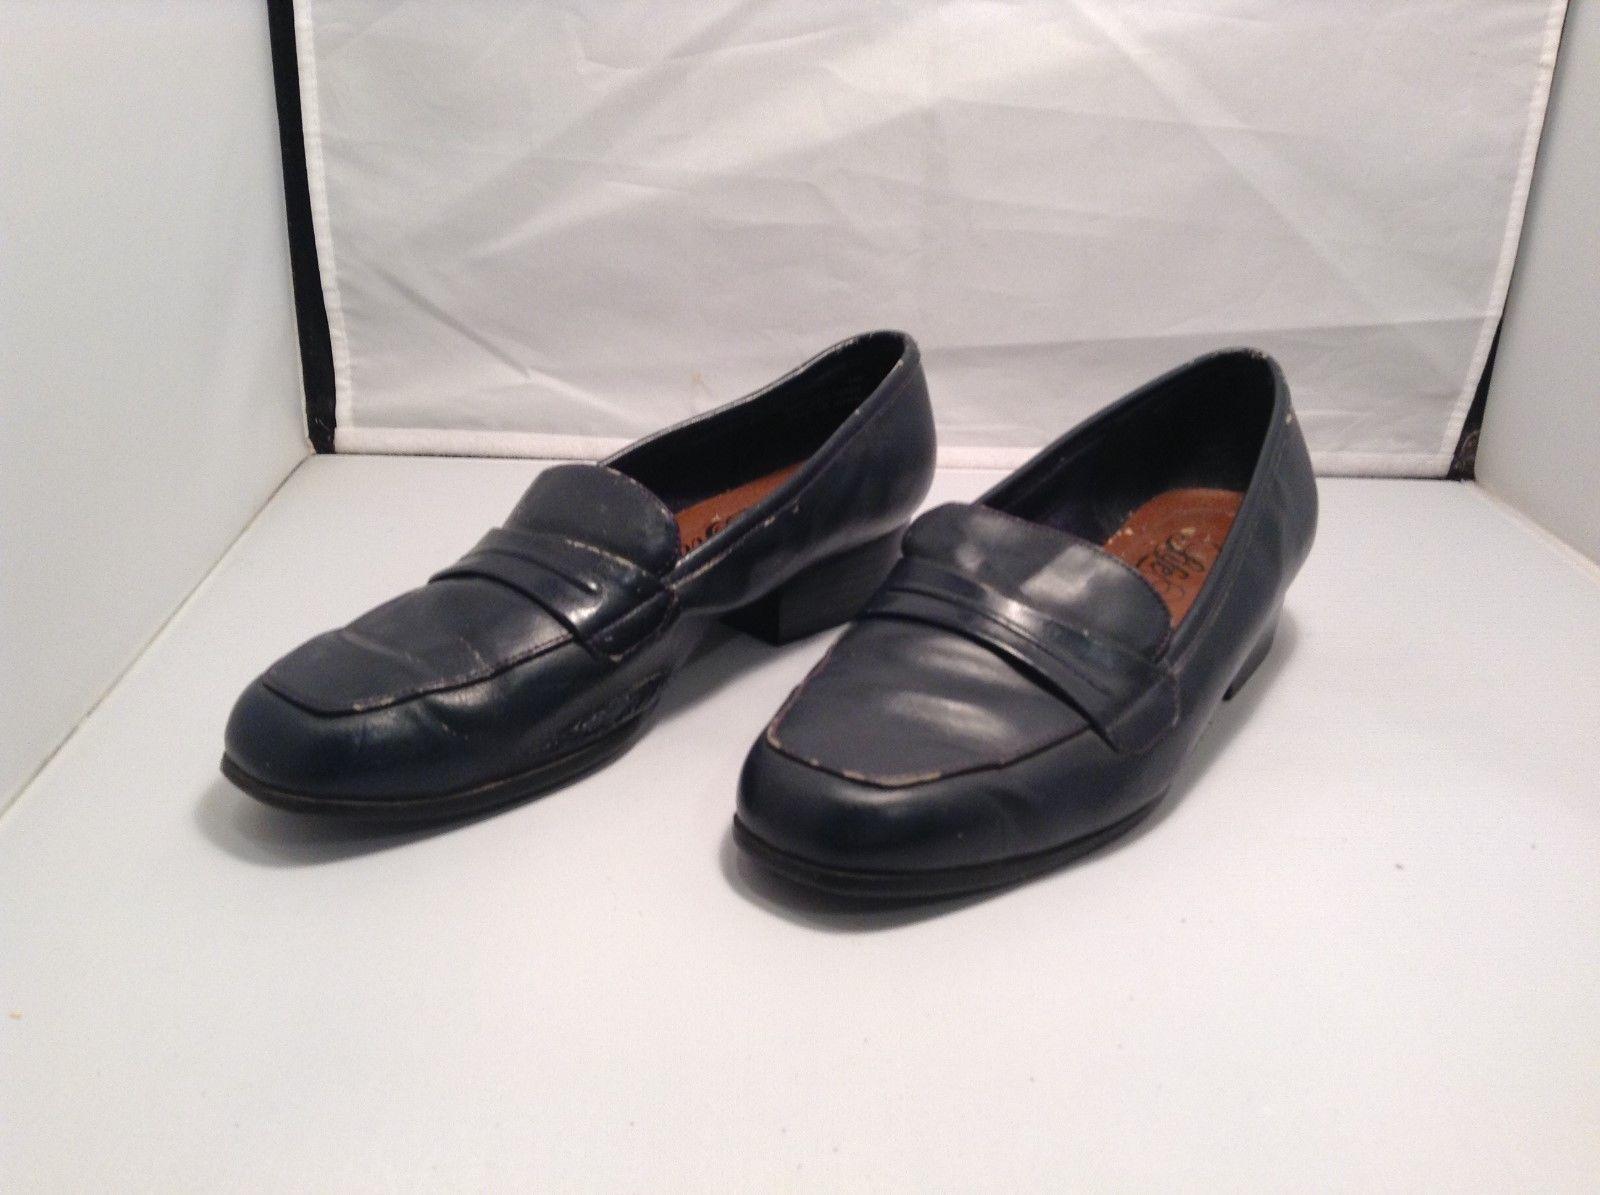 LifeStride Women's Black Leather Slip On Flats Sz 7.5W